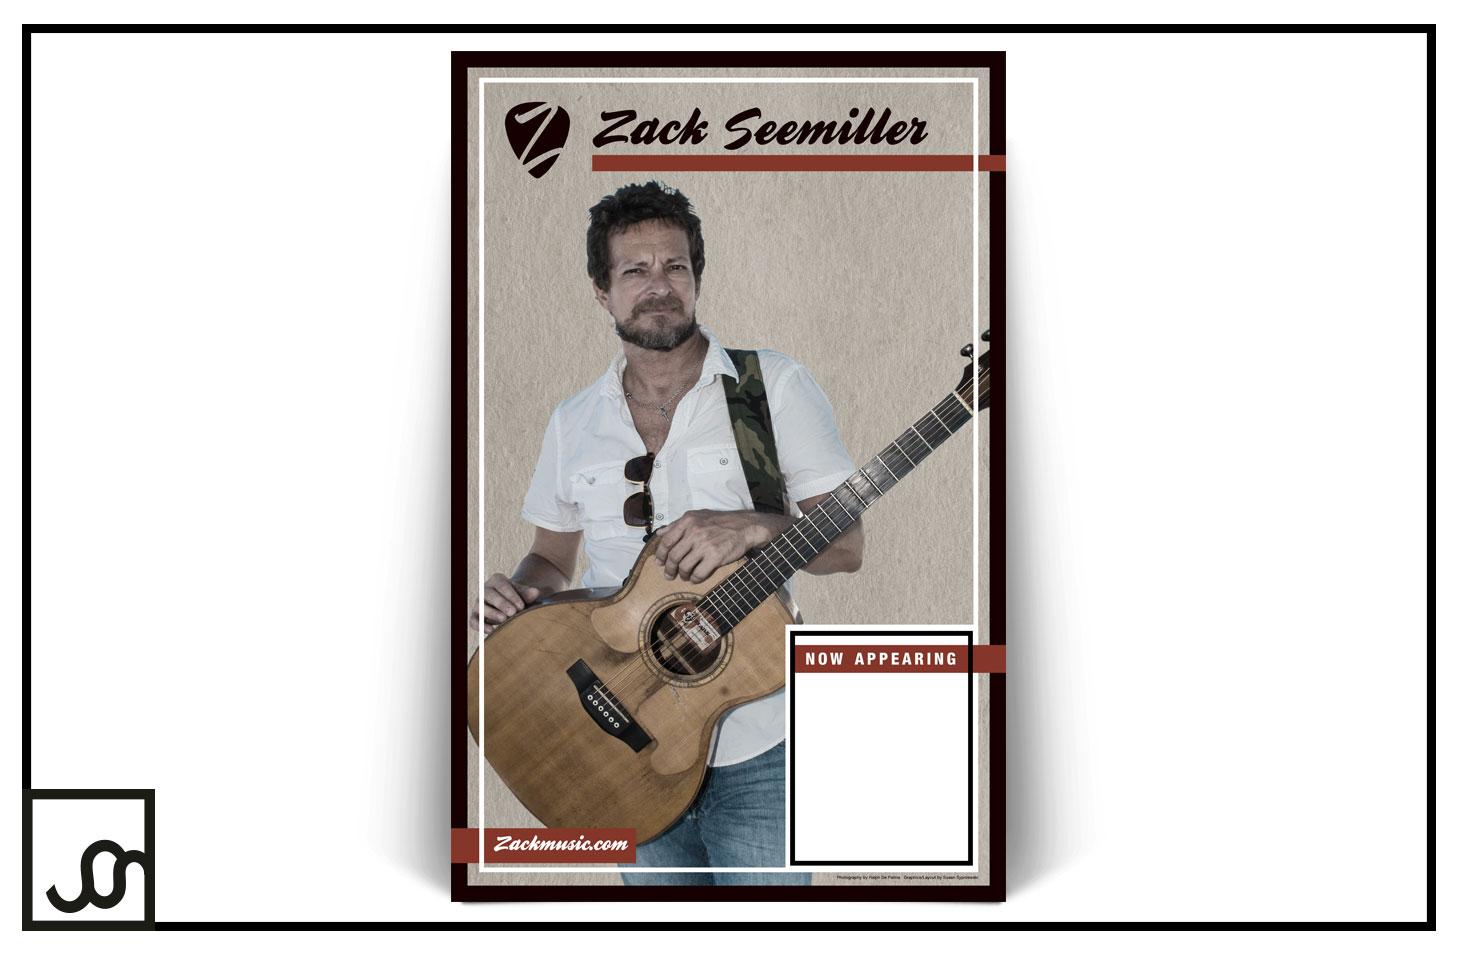 Zack Seemiller Promo Poster